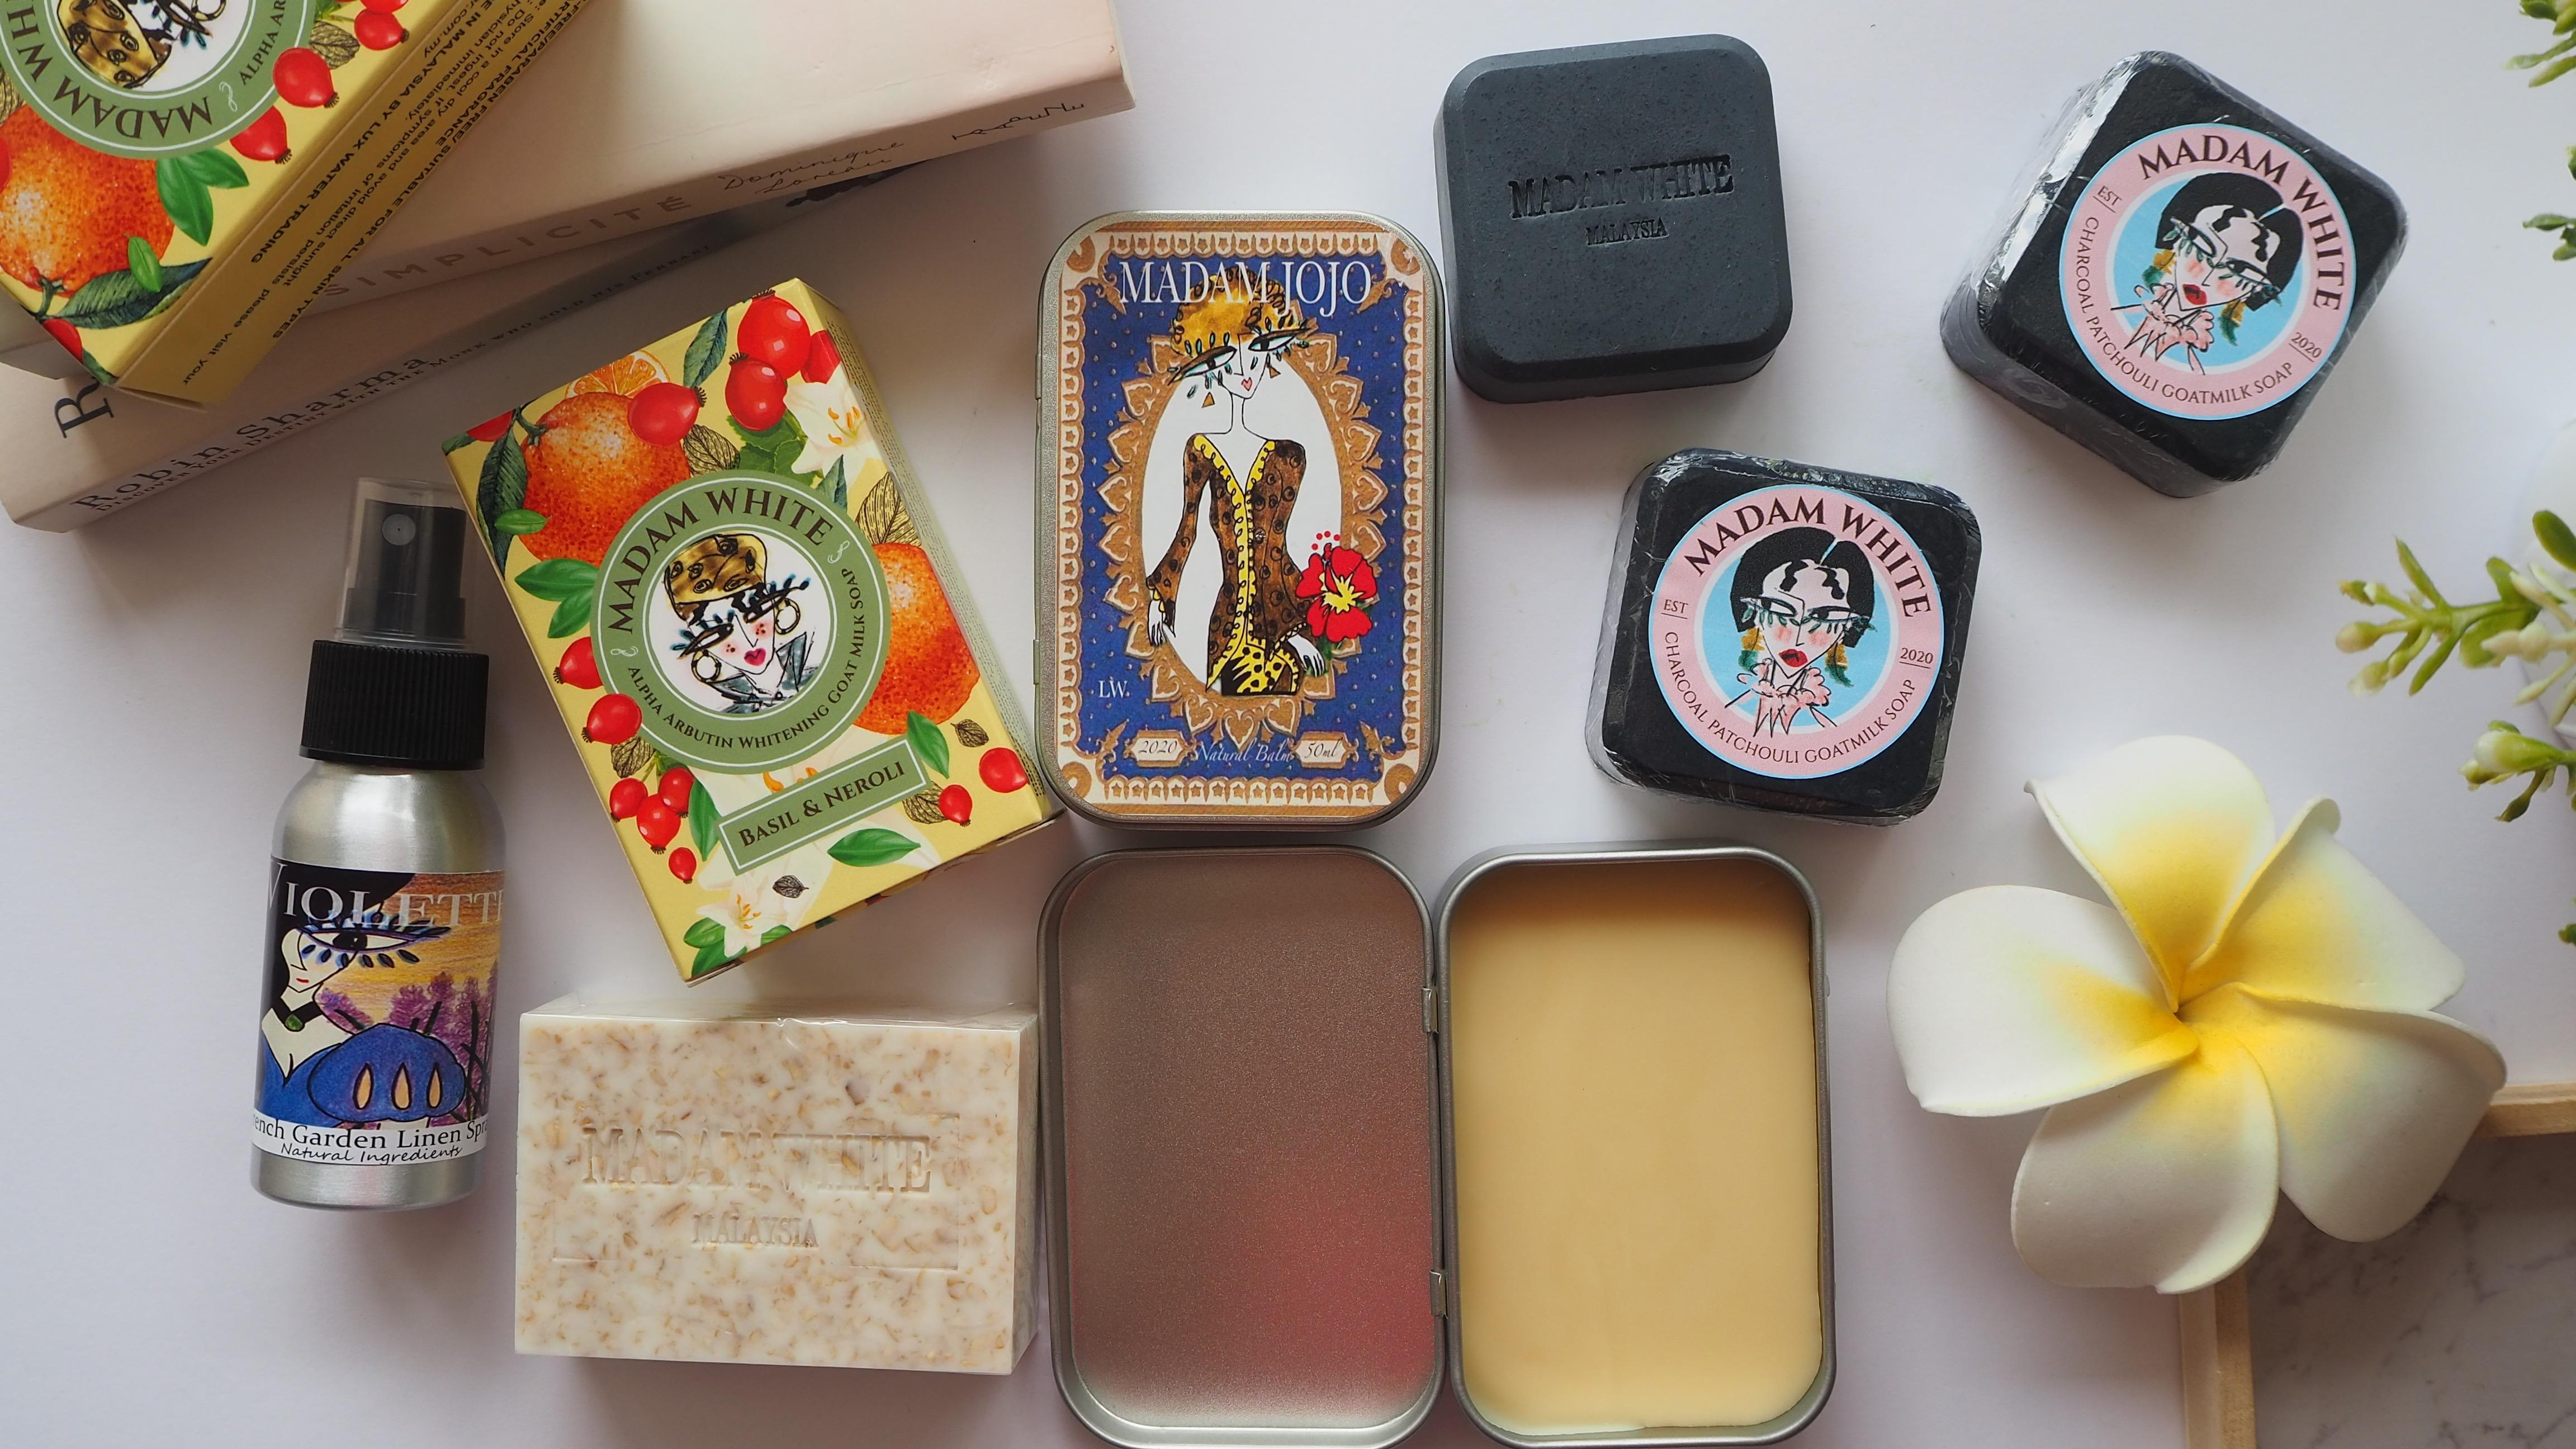 Madam White | Artisanal Skin Care Products